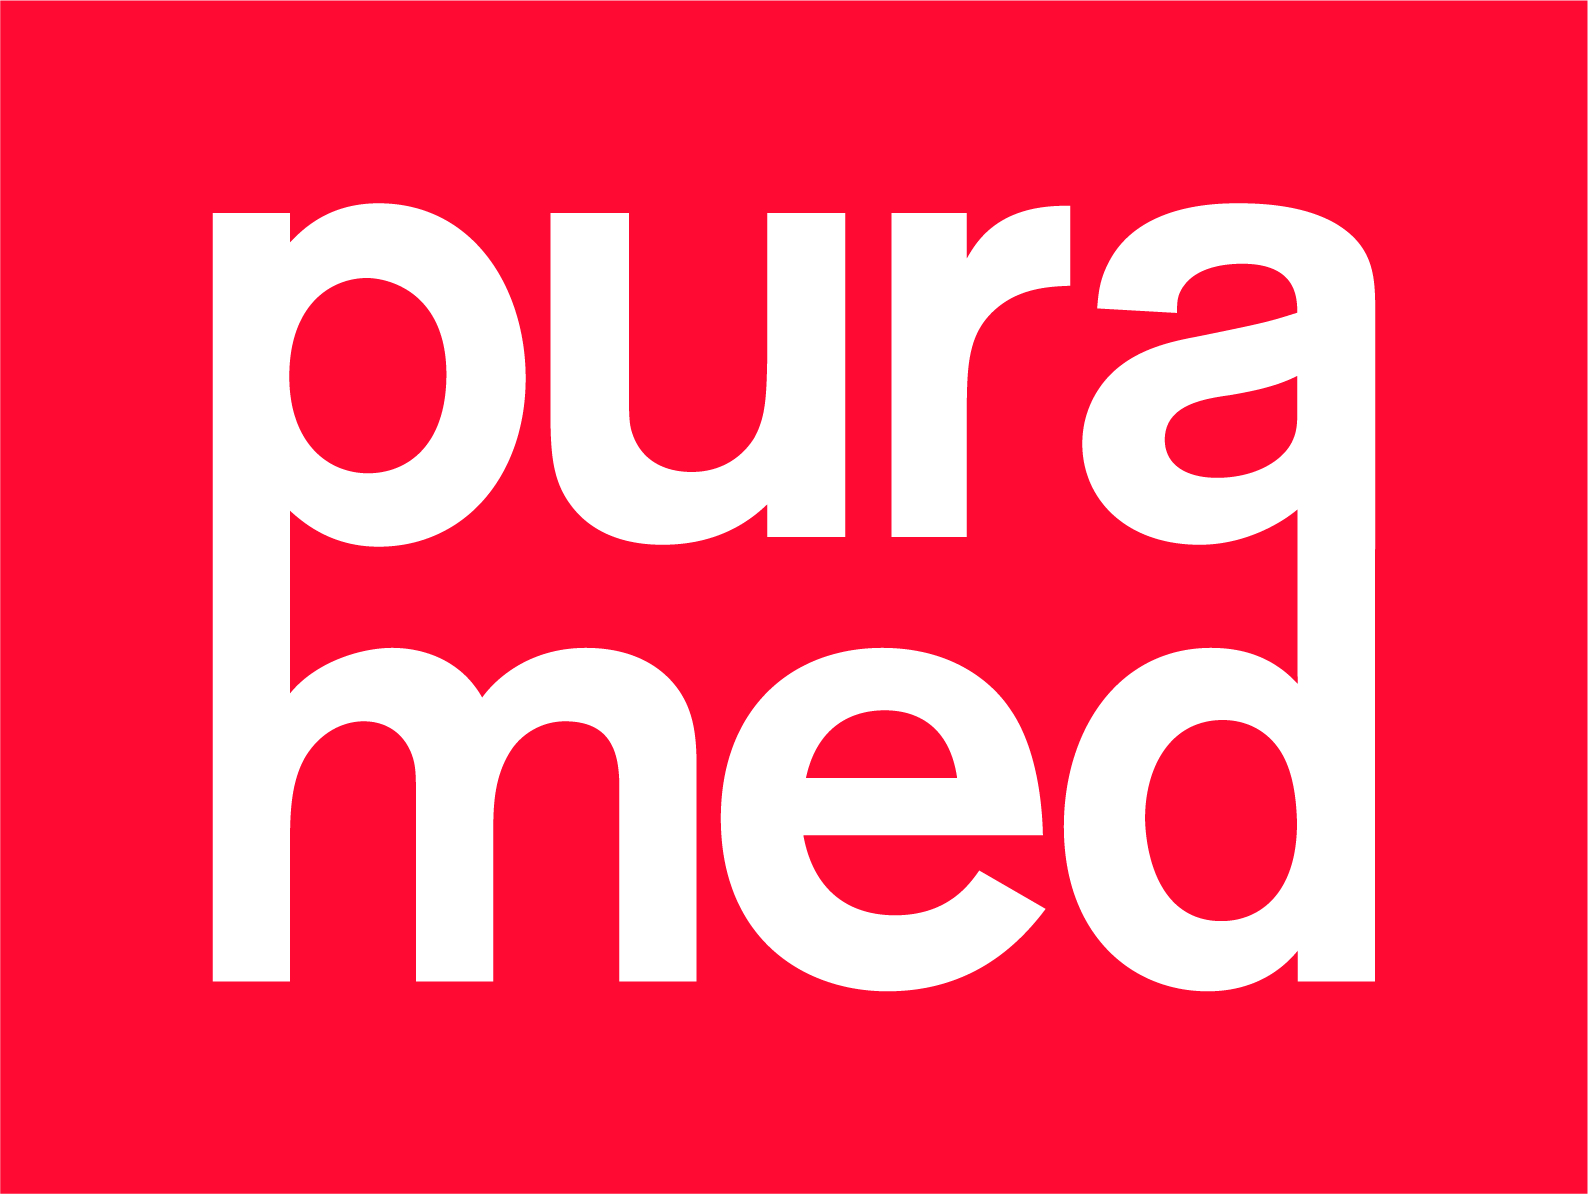 171388_puramed_logo_CMYK kopie